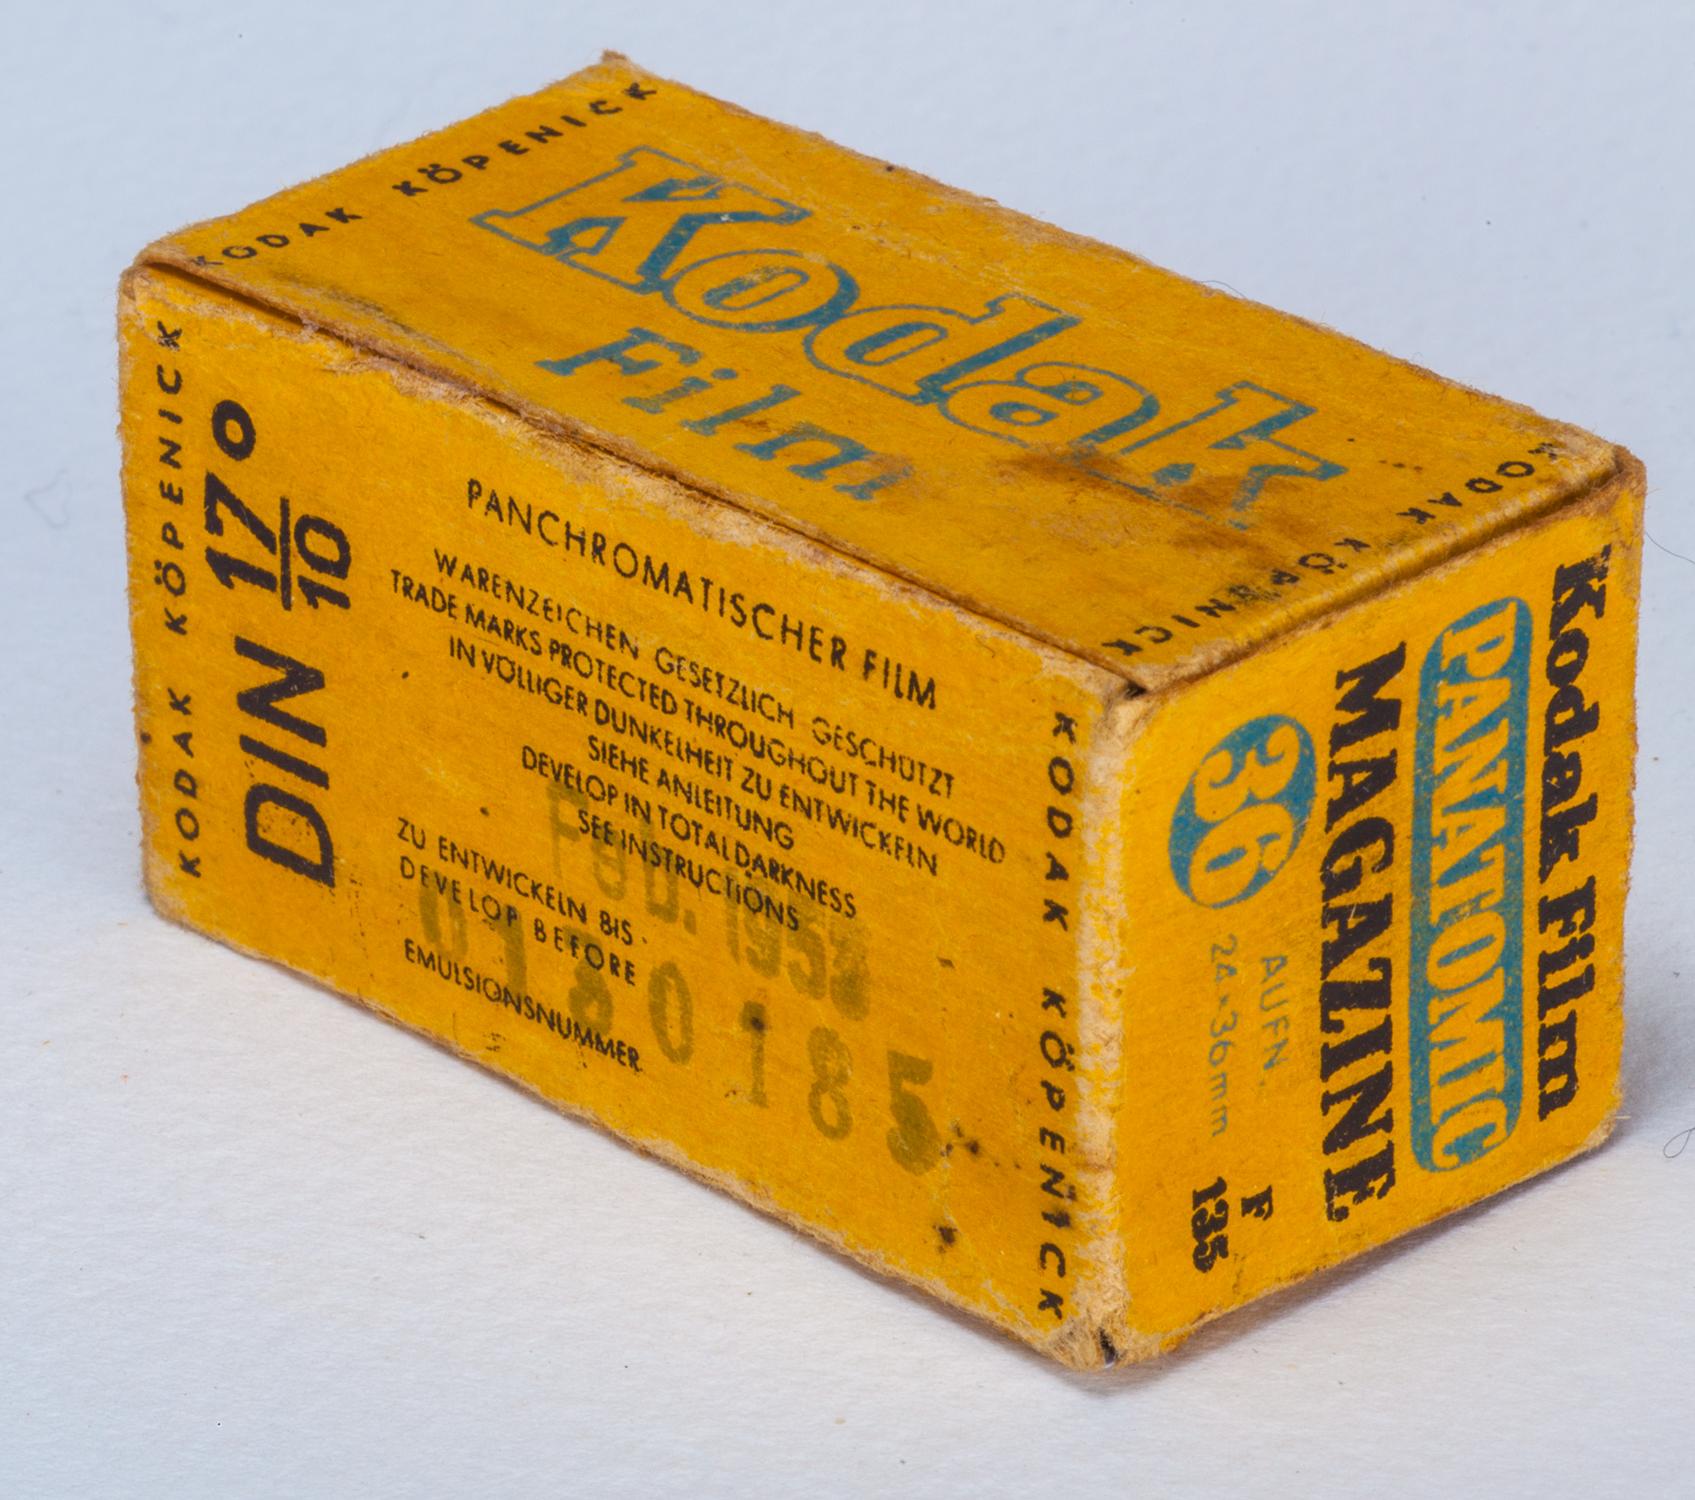 German Kodak film (Pic: Joerg Kowalski)